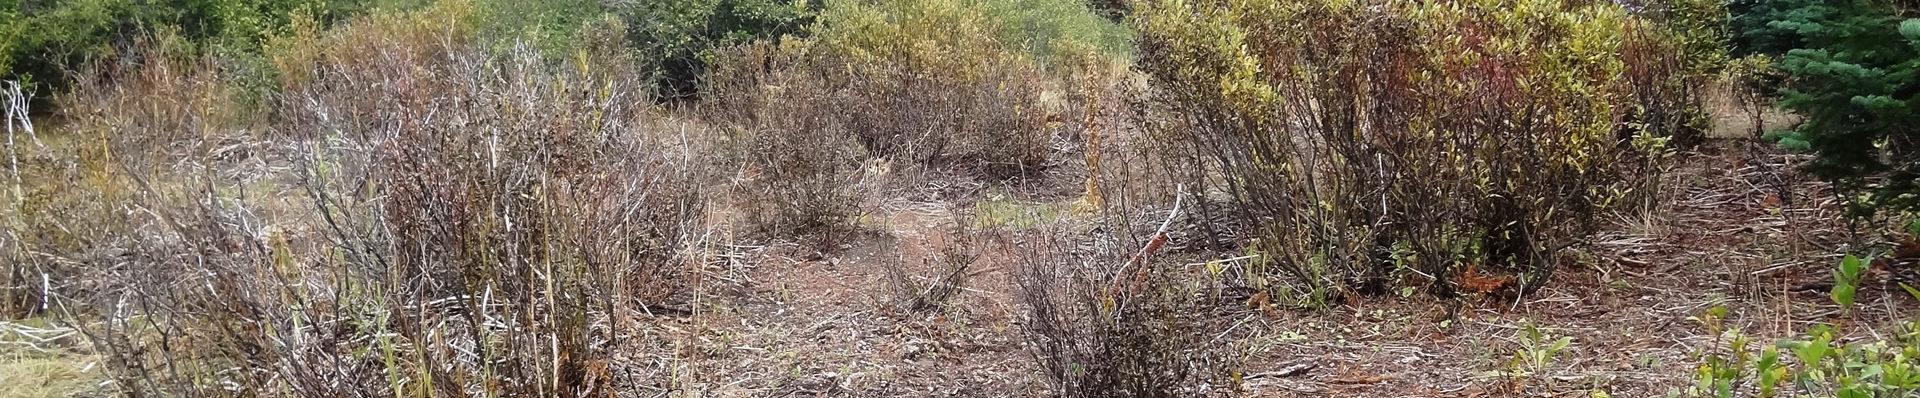 Degraded Willow Wetland Big Meadows